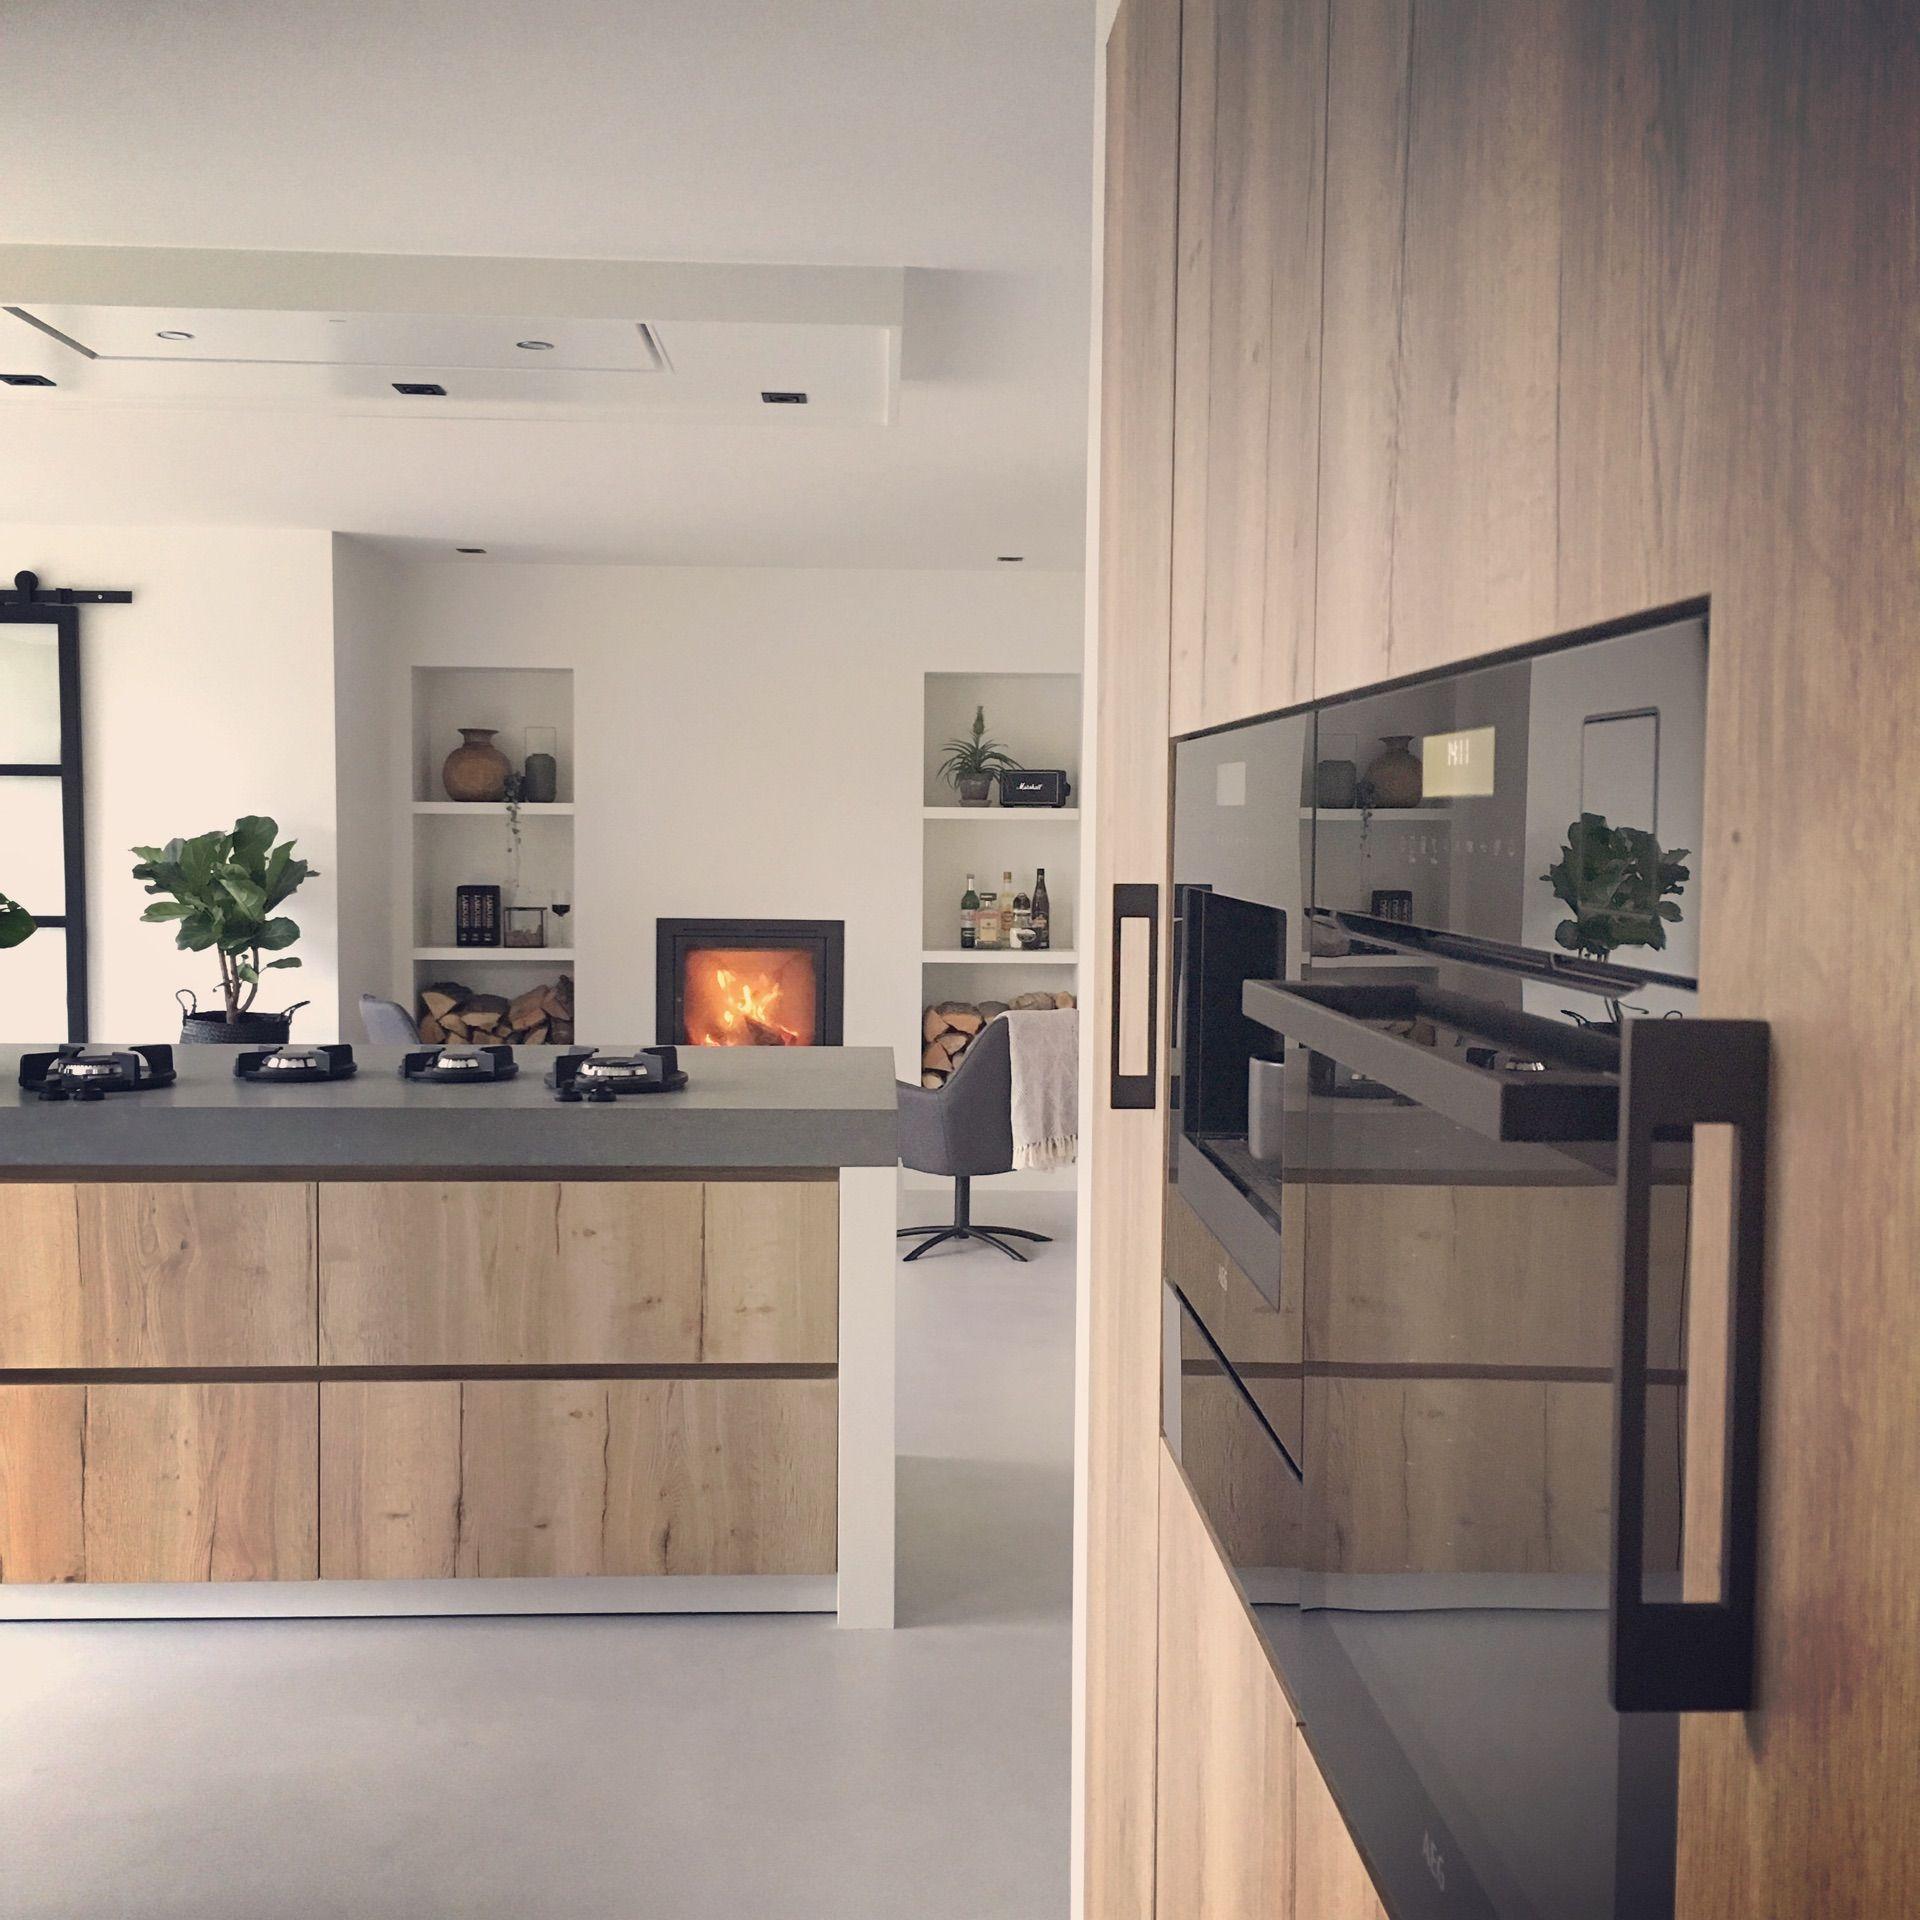 Apartment Kitchen Sink Clogged: Keuken - Binnenkijken Bij Wonenbydjo